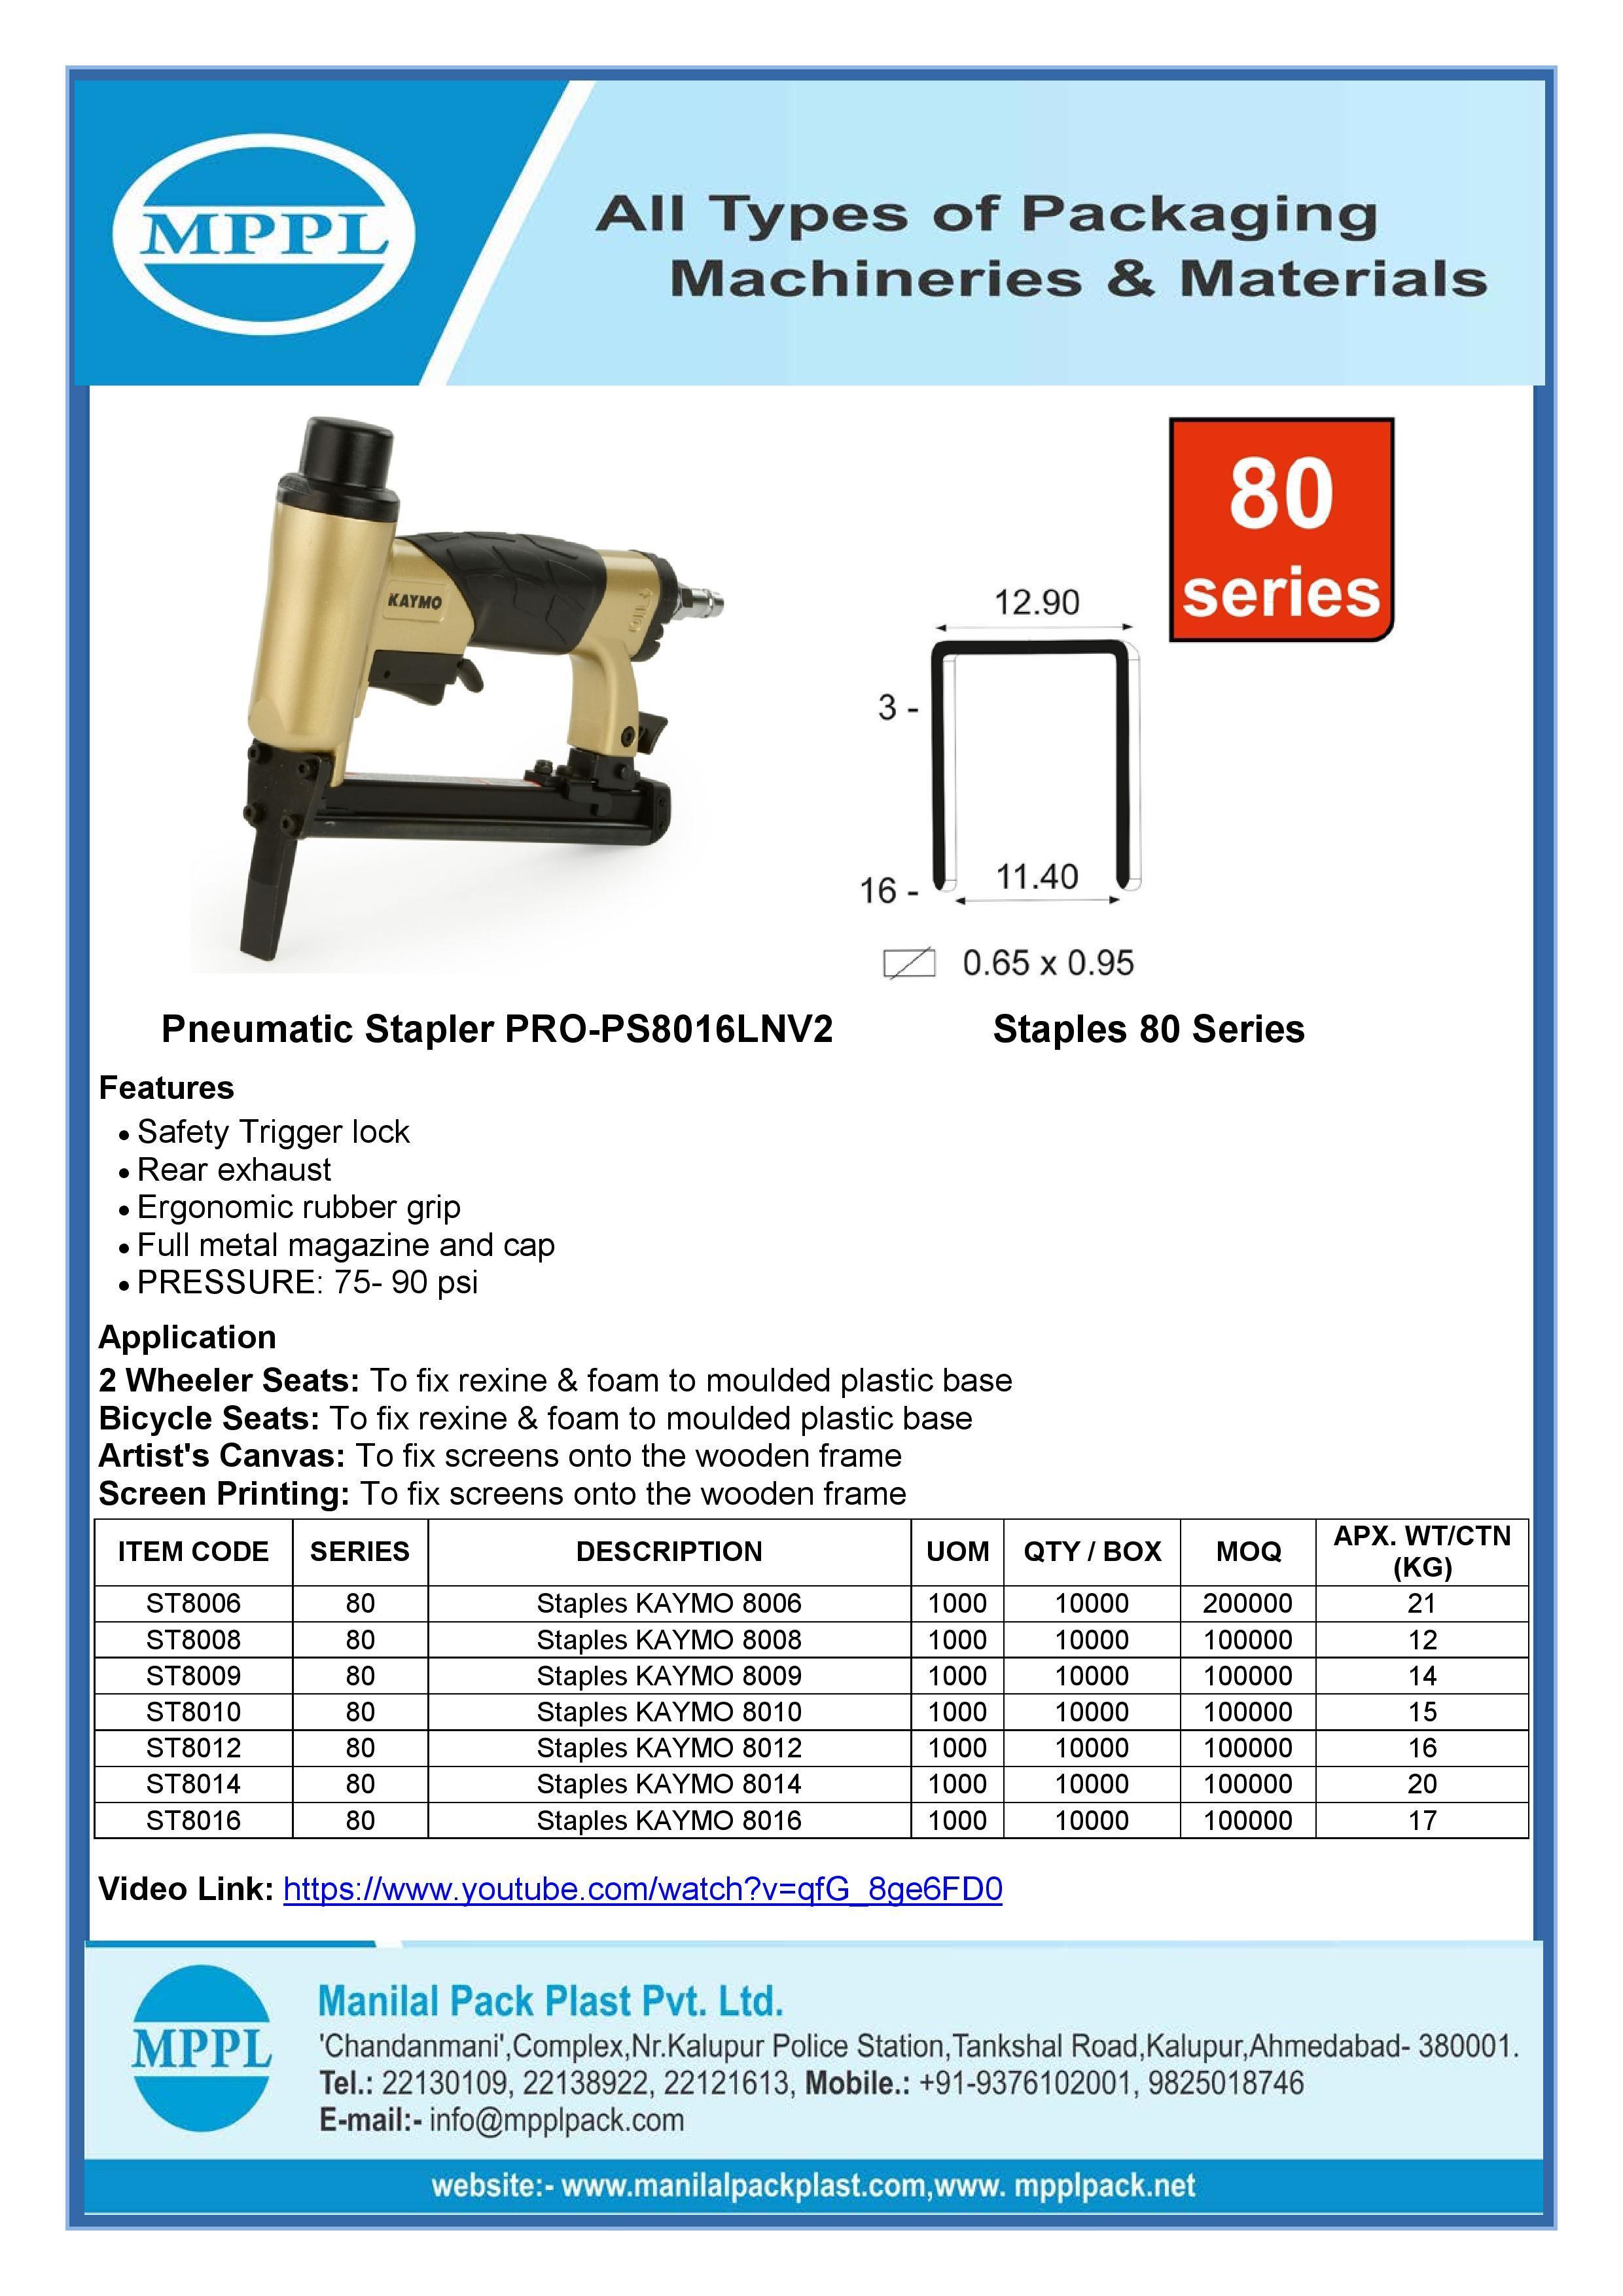 Pneumatic Stapler PRO-PS8016LNV2